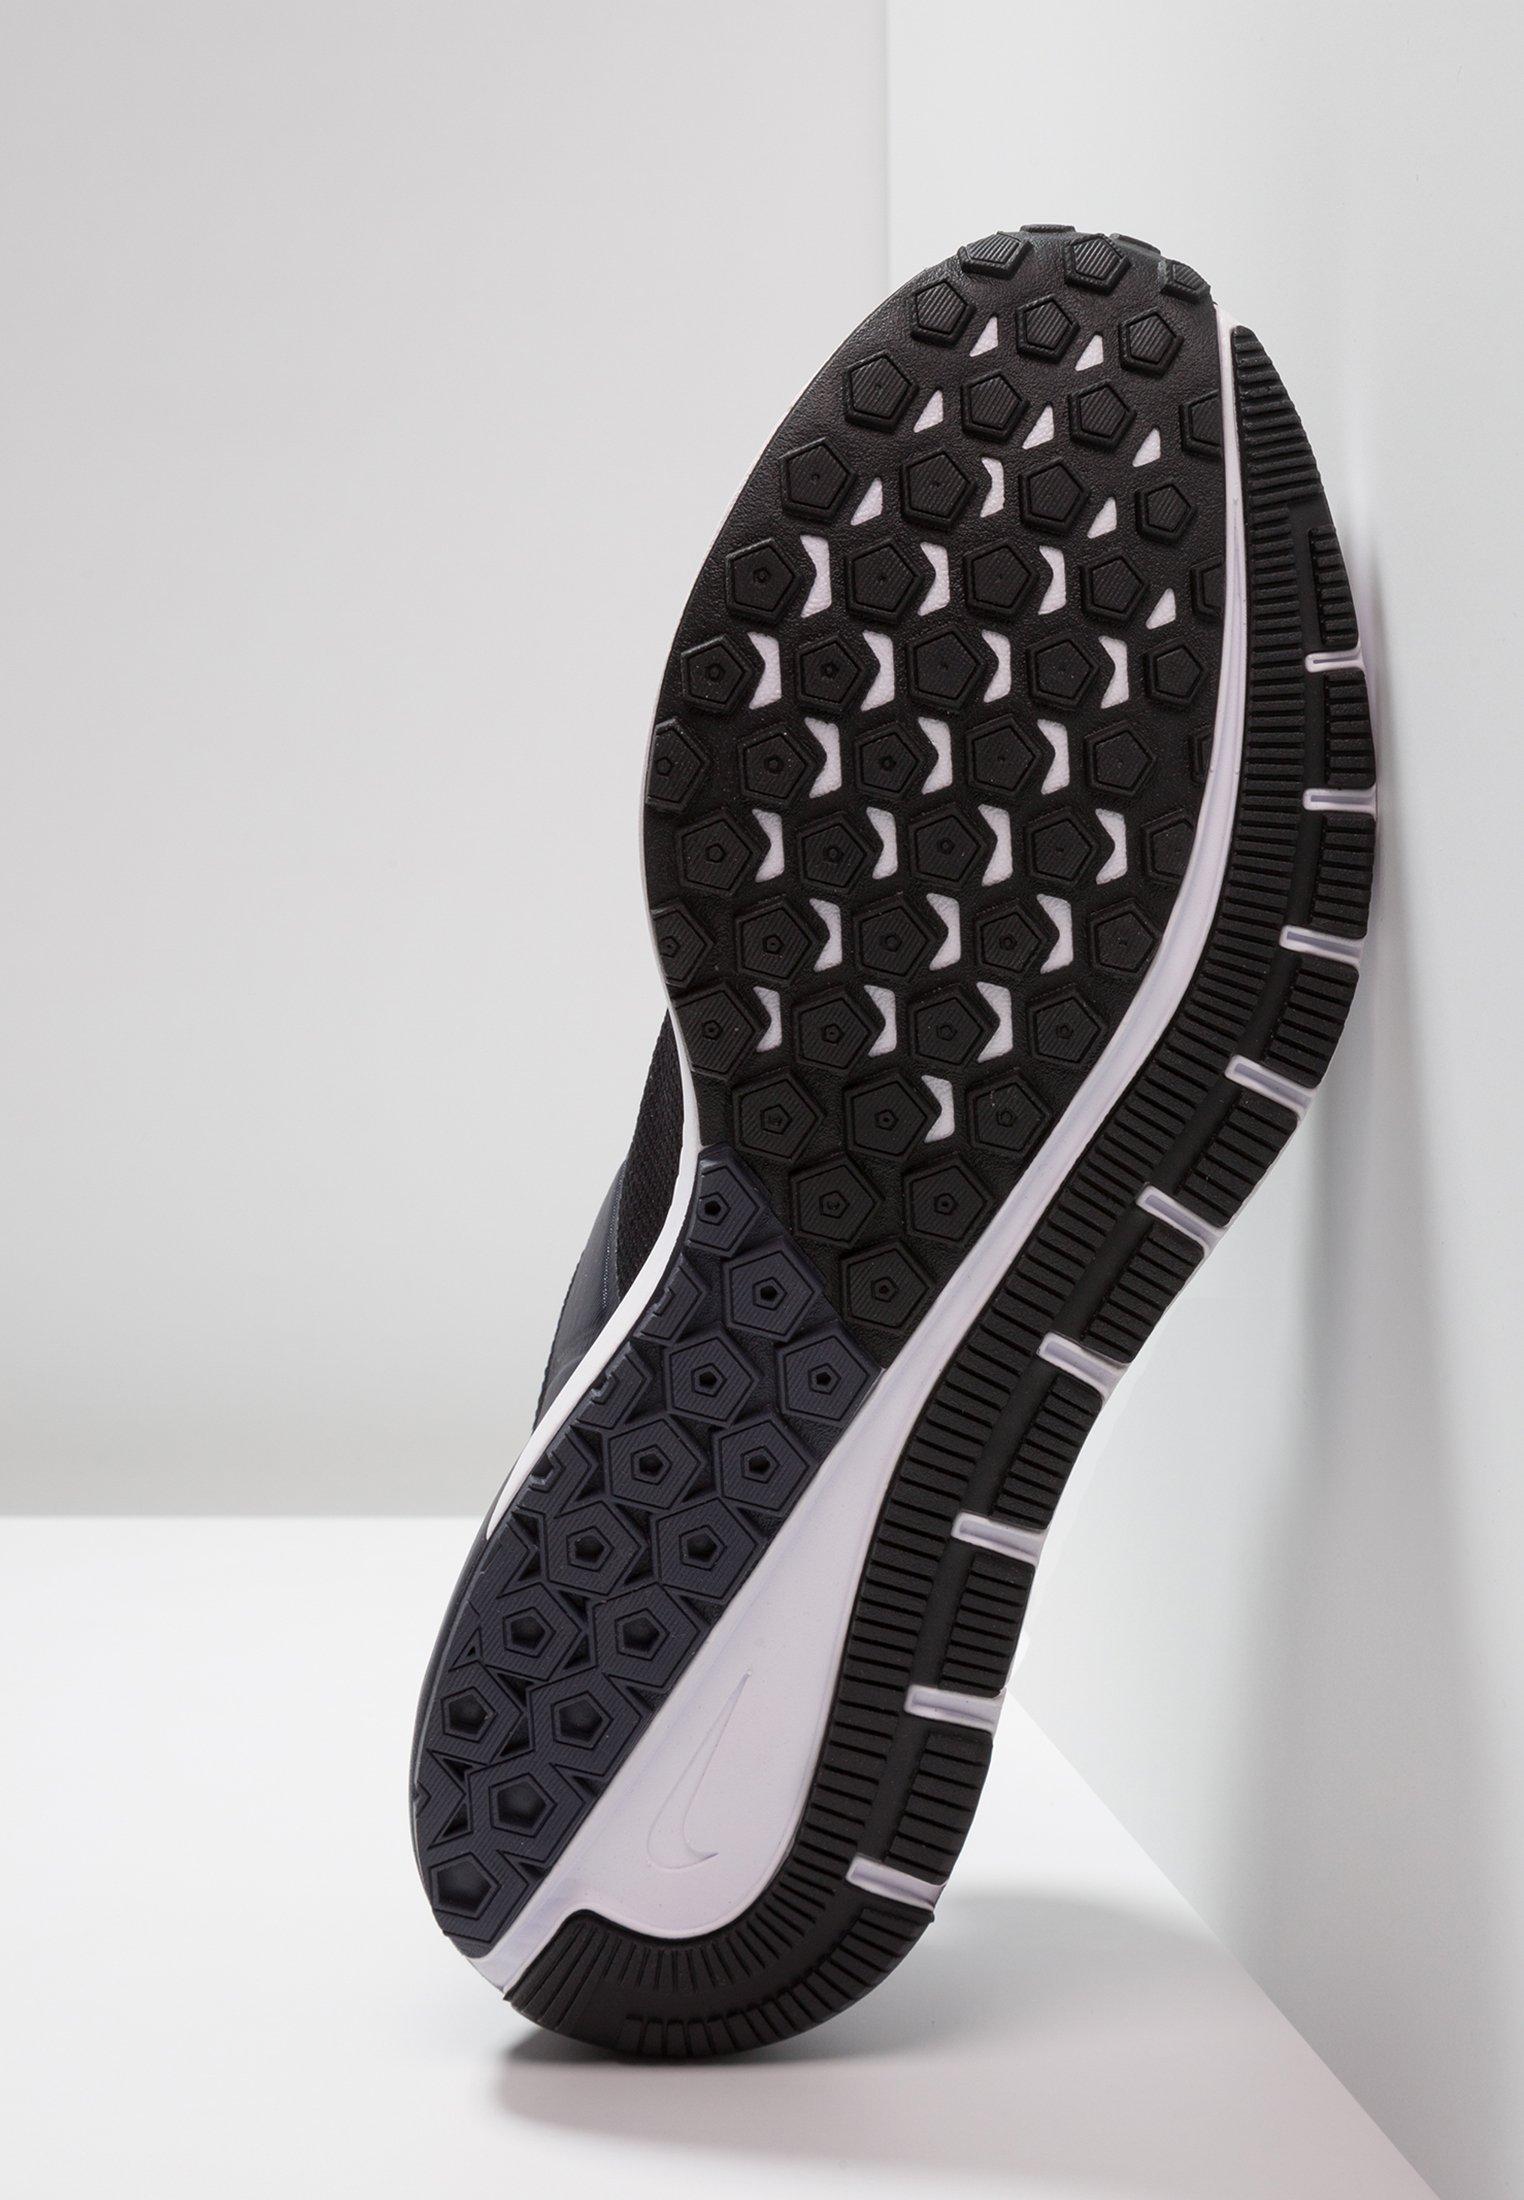 De Performance Zoom Nike Black Stables gridiron Running Air white StructureChaussures vN0O8wymn